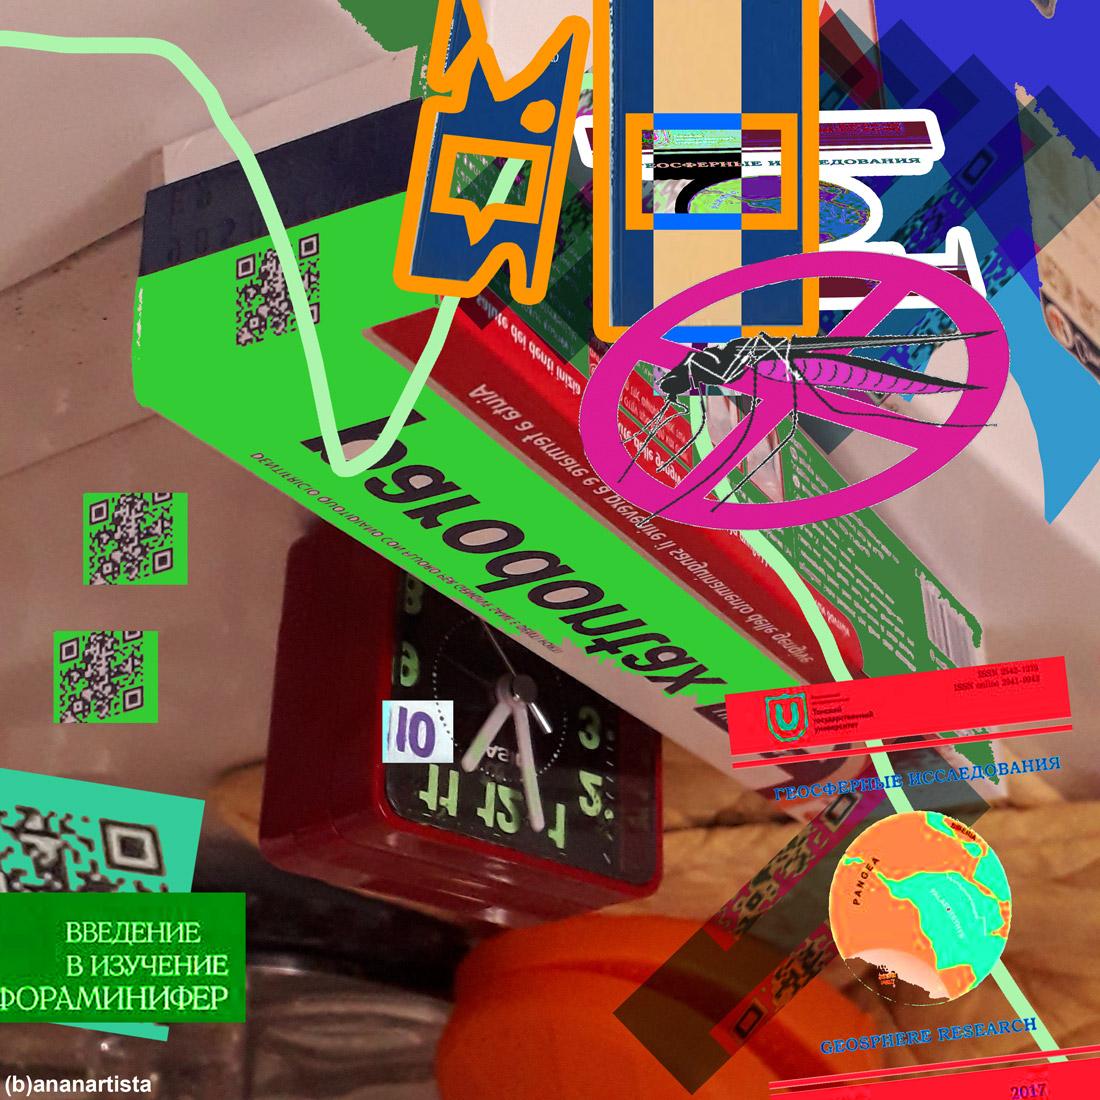 horrible art: digital collage by (b)ananartista sbuff